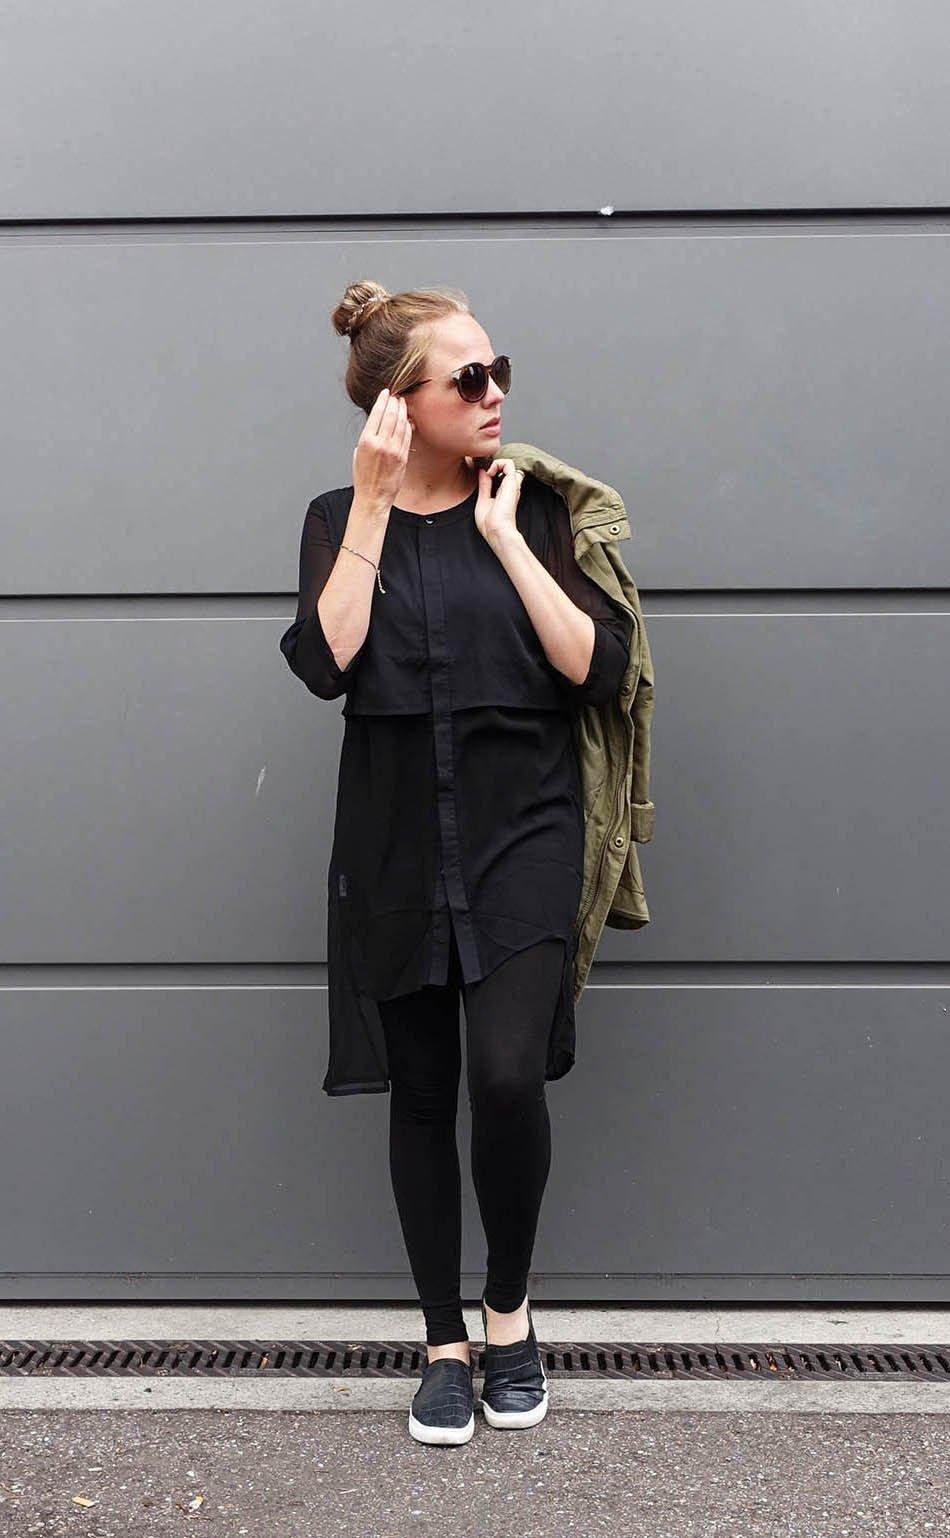 Herbst Outfit 2015 Parka all black ekulele fashionblogger schwarz (3)